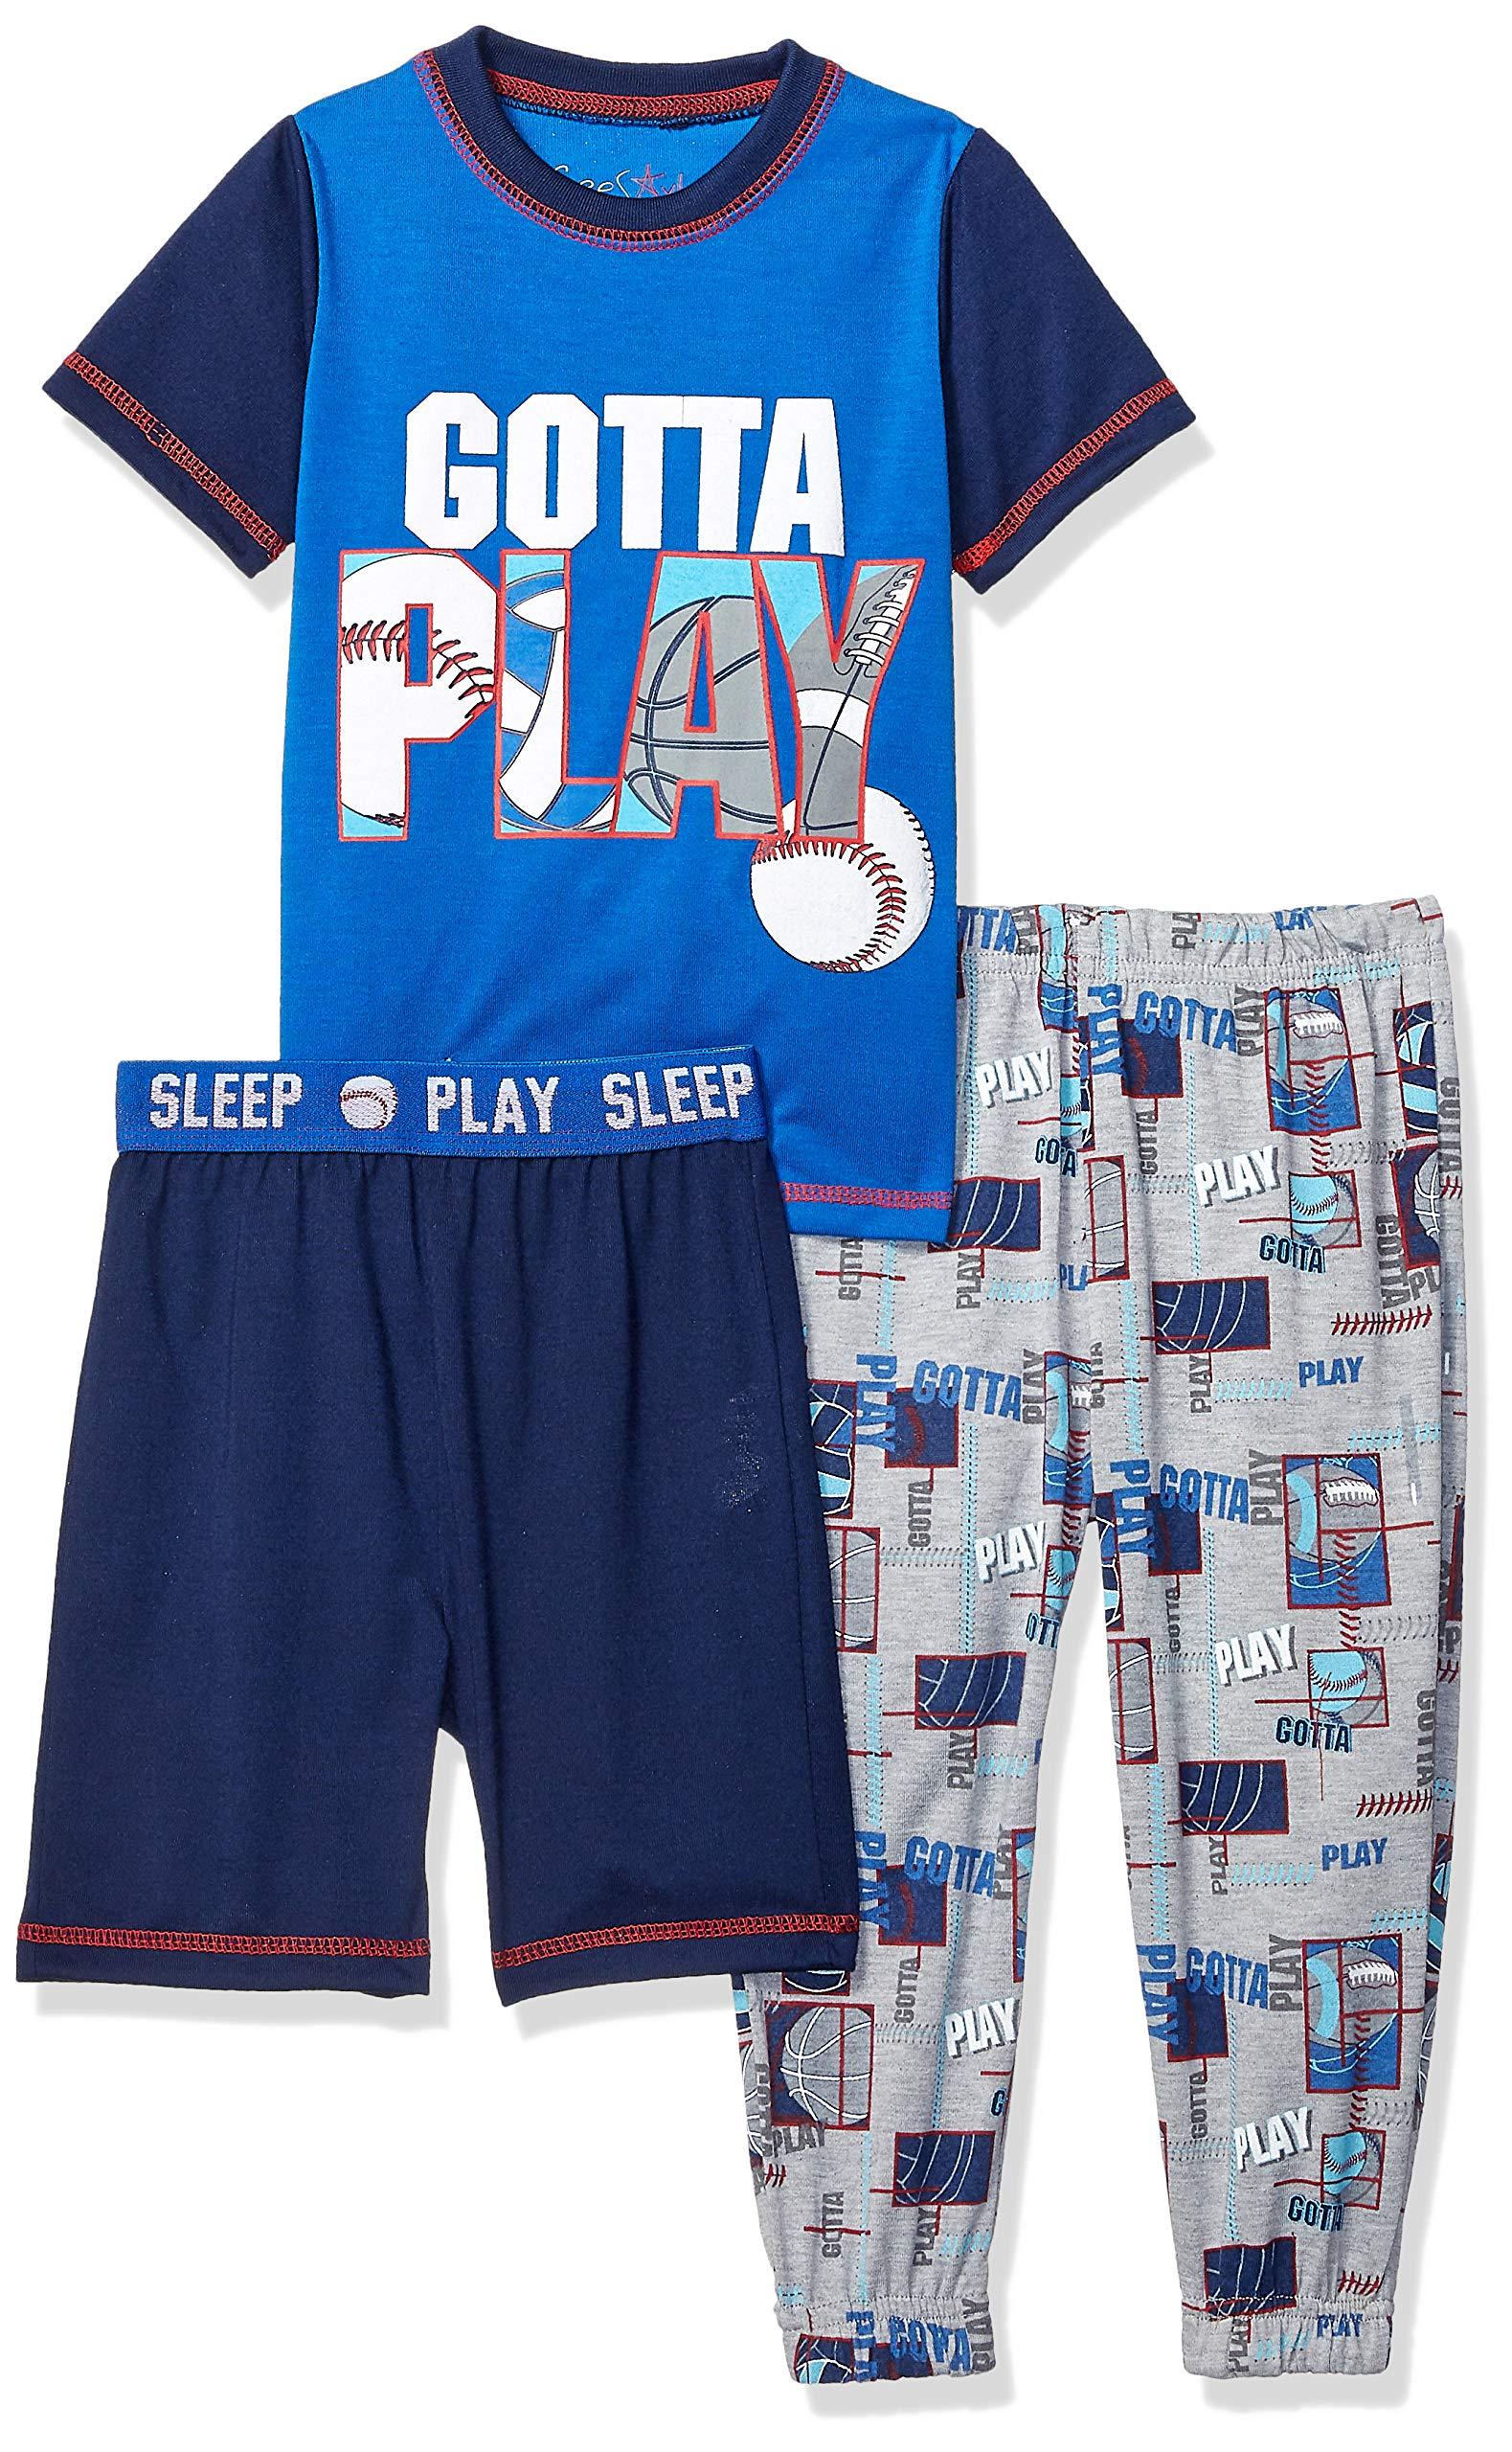 Freestyle Revolution Boys' Little Gotta Play Sleep 3Pc Set T-Shirt, Shorts, Pants, Multi 6